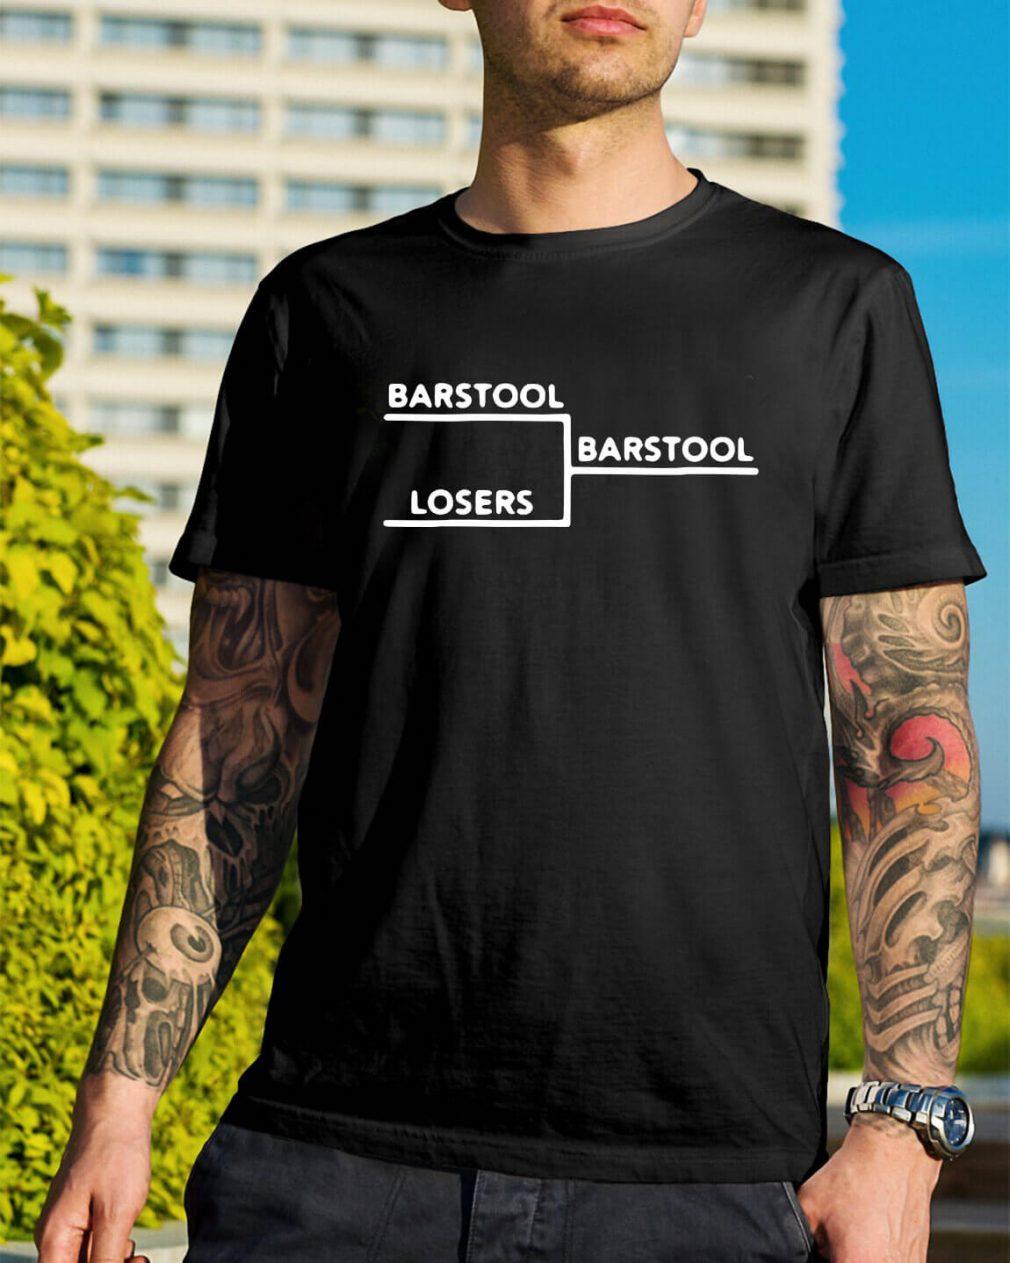 Barstool losers shirt